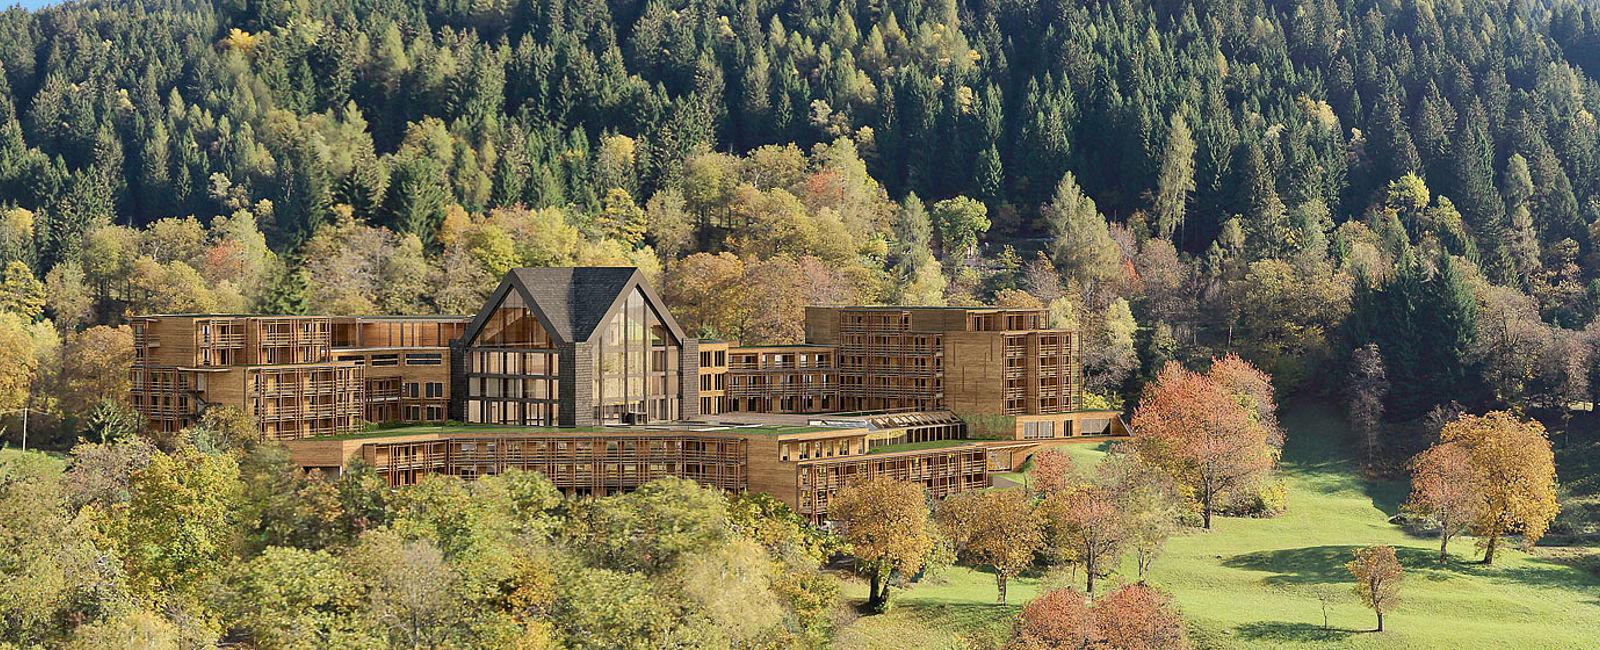 Lefay Resort Amp Spa Dolomiti Trentino Italien Connoisseur